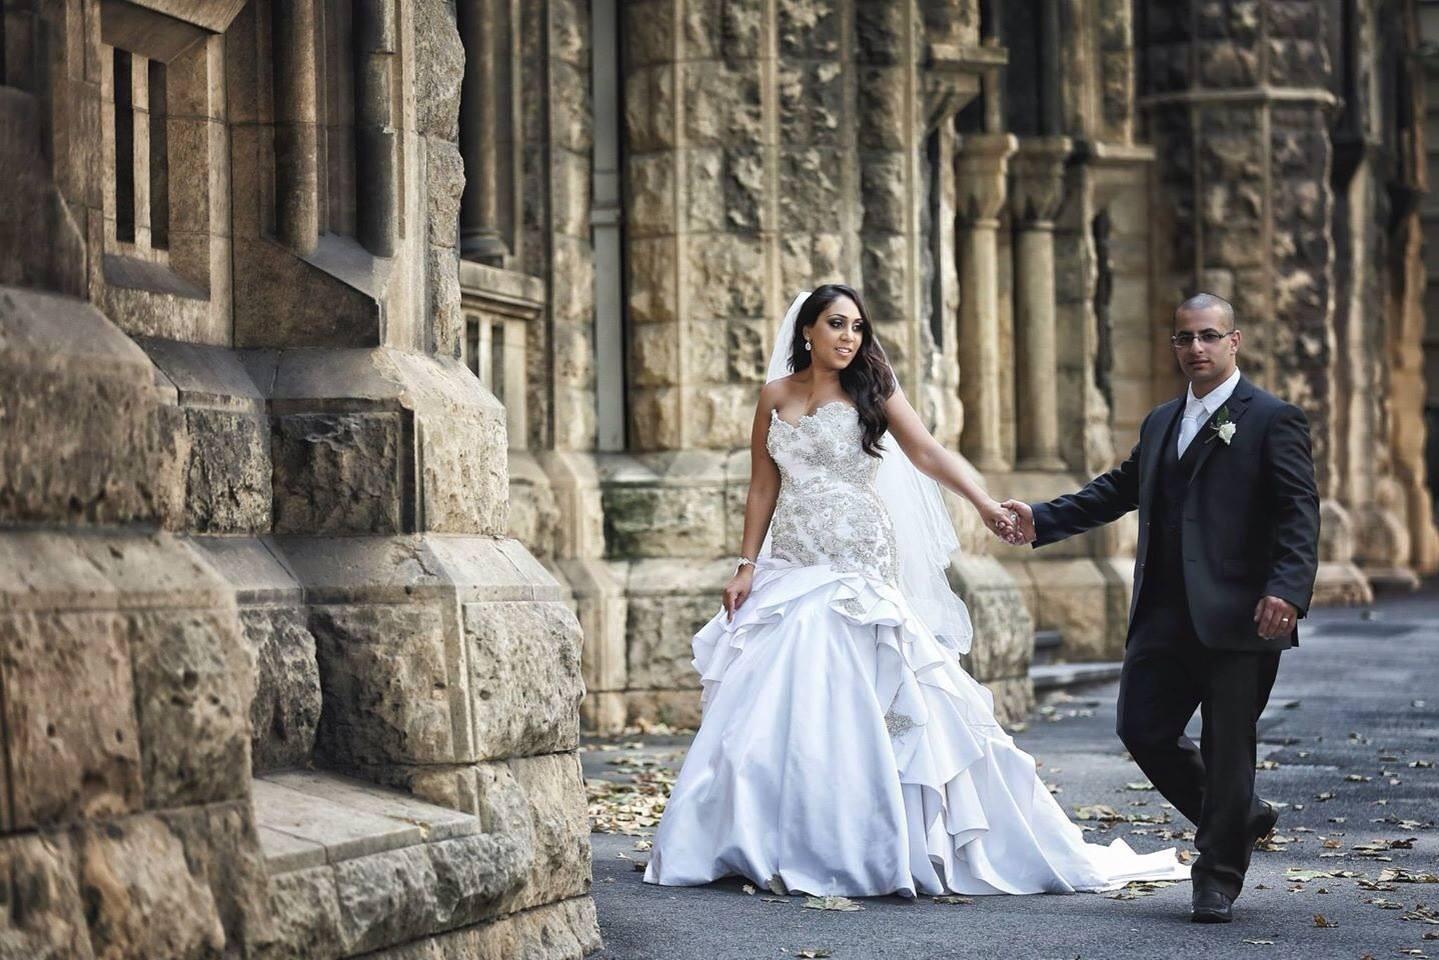 Simple Wedding Dresses Aus: Judith Valente Preowned Wedding Dress On Sale 90% Off